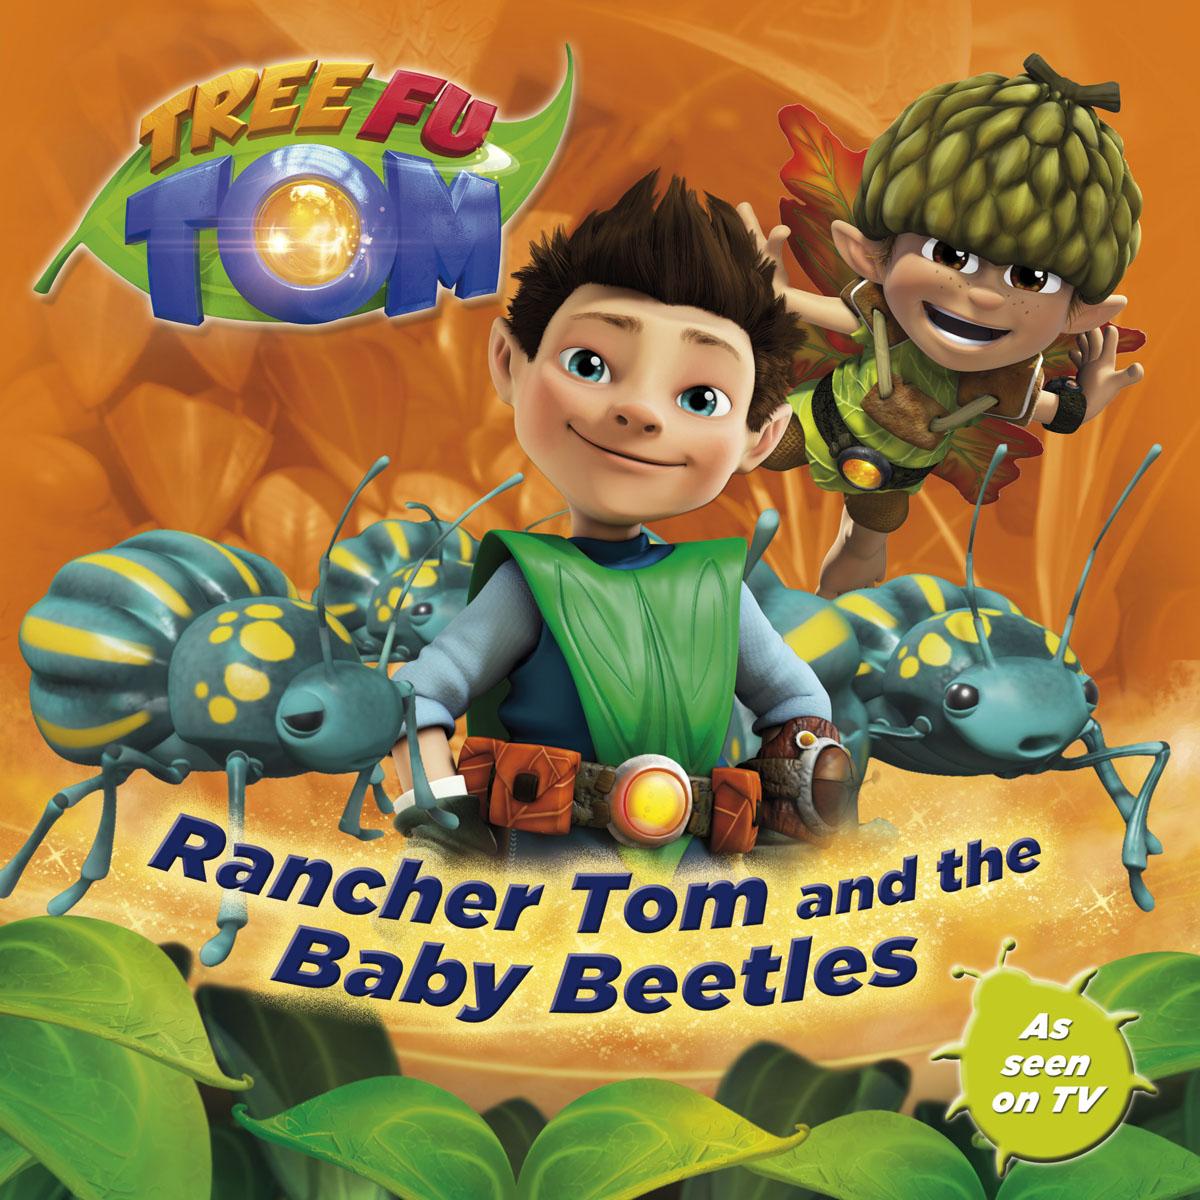 Купить Tree Fu Tom: Rancher Tom and the Baby Beetles,